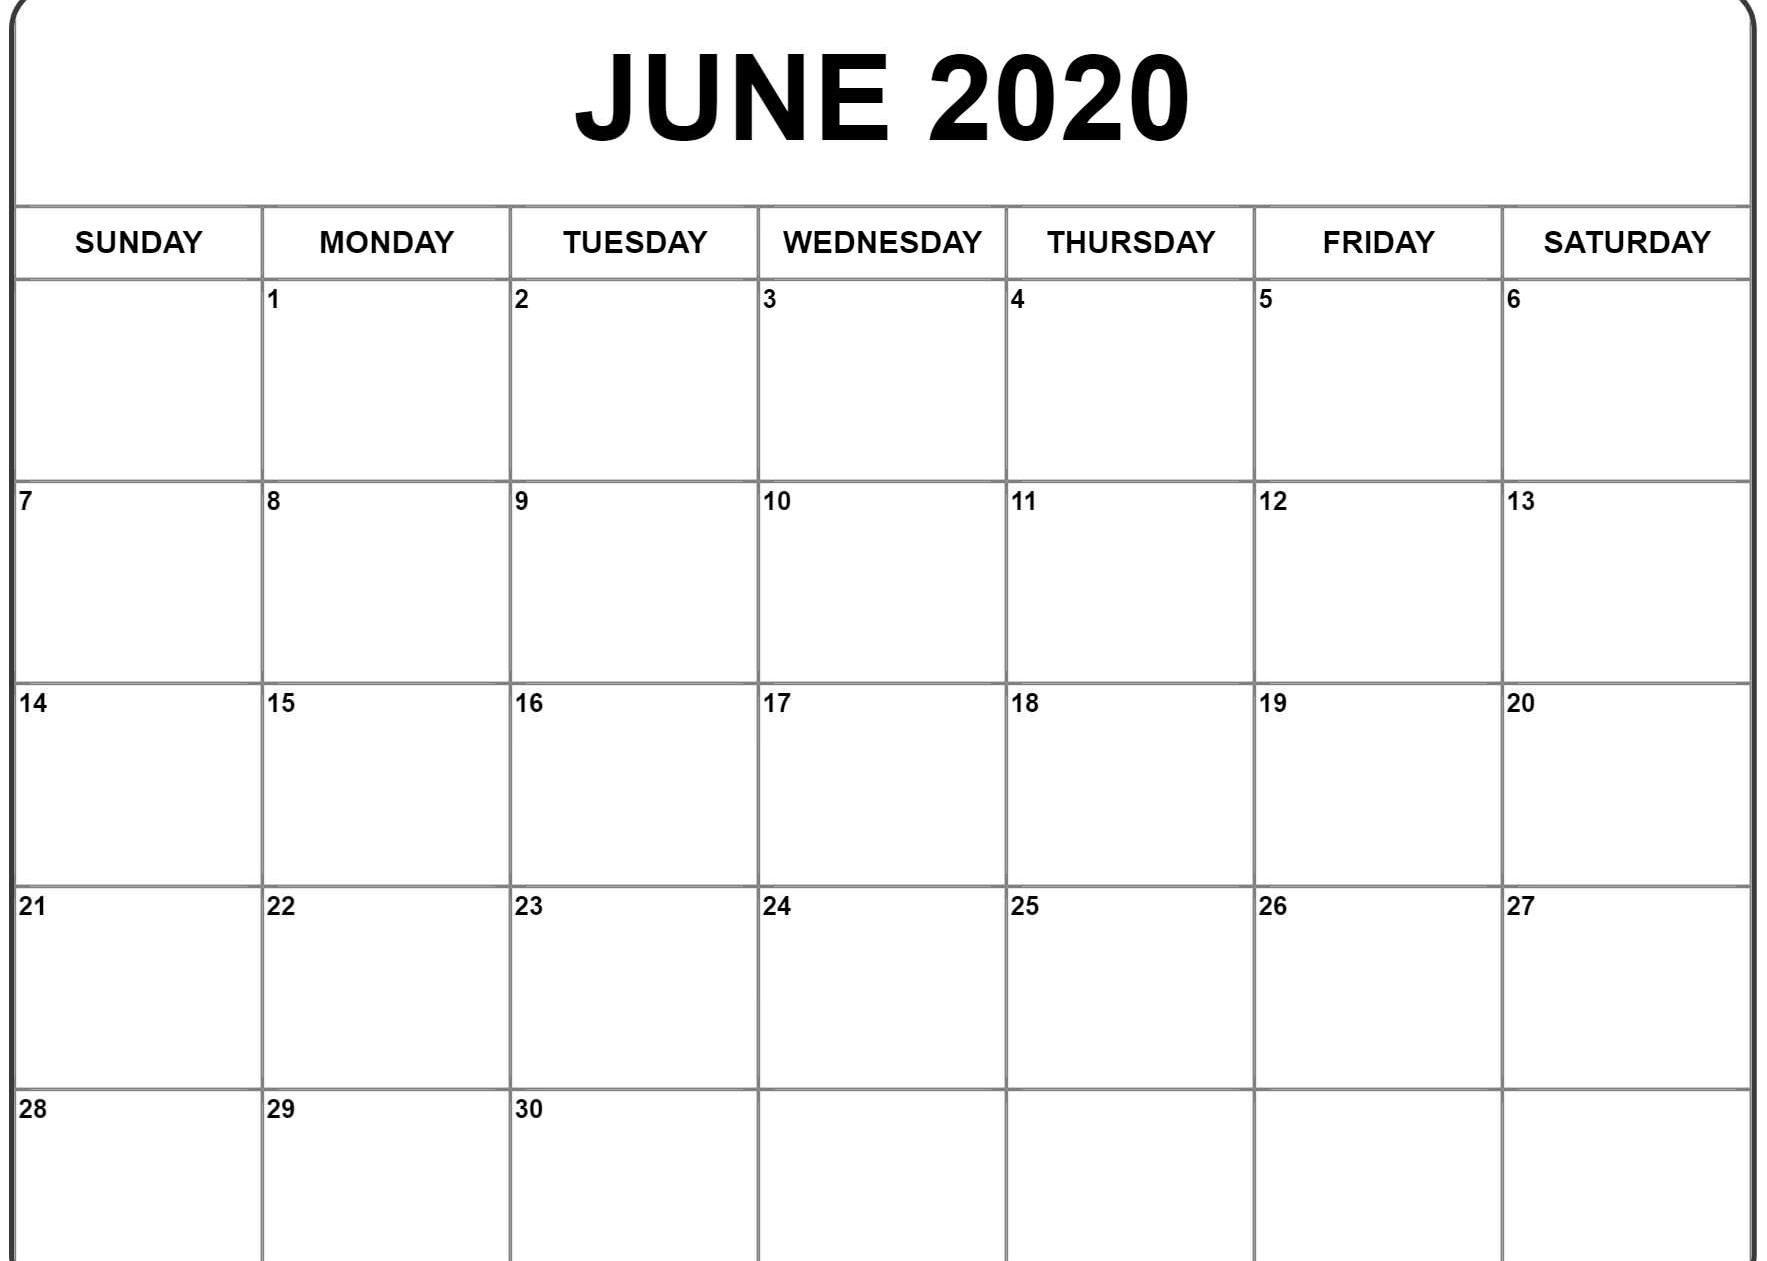 June 2020 Calendar Pdf, Word, Excel Template-Calendar Word 2020 Microsoft Word Monthly